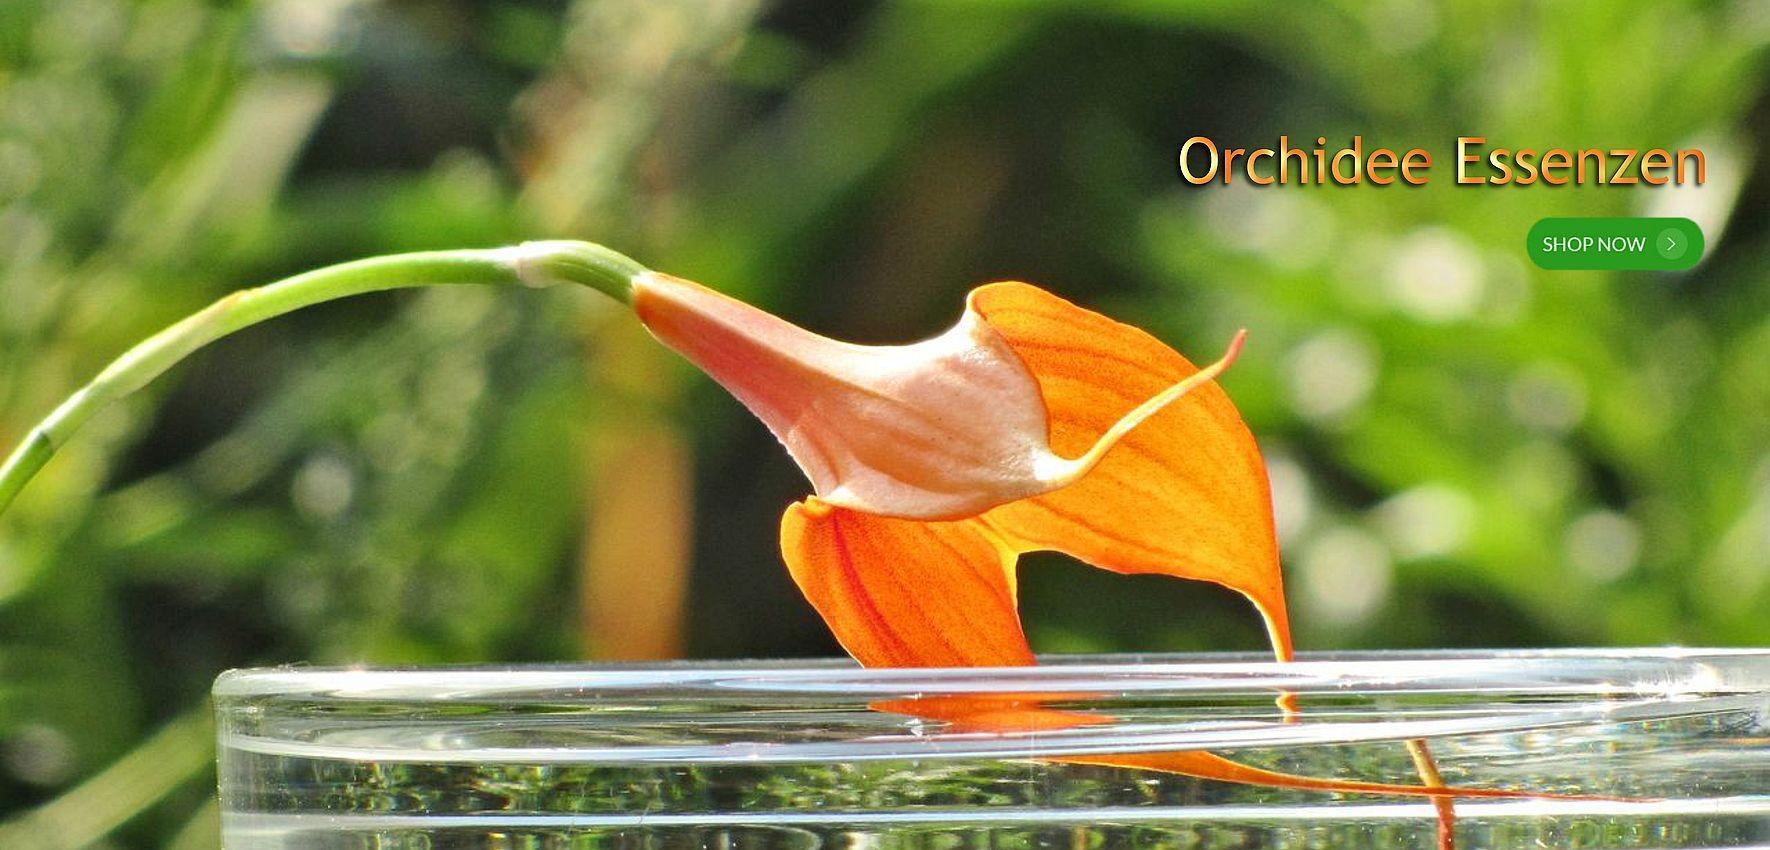 Orchideenessenzen